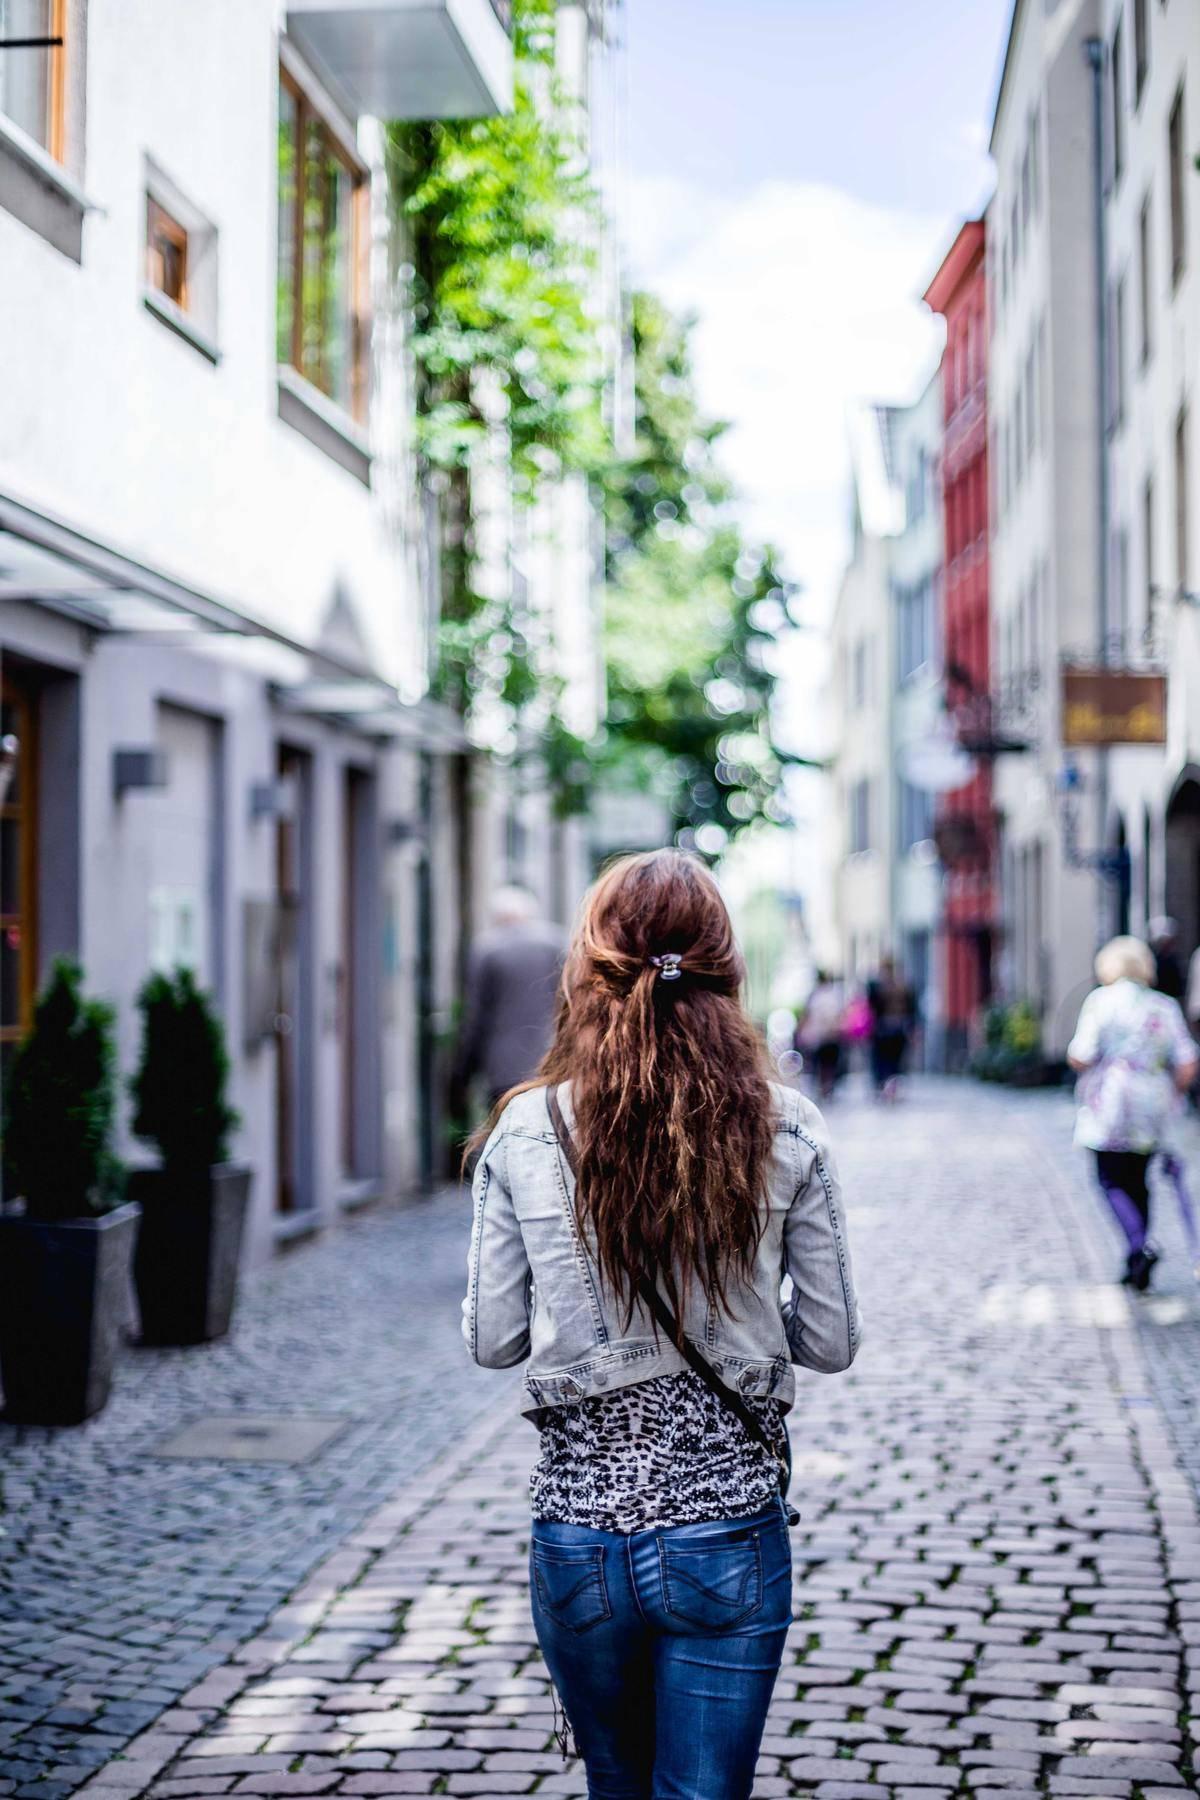 Woman walking down cobblestones alone